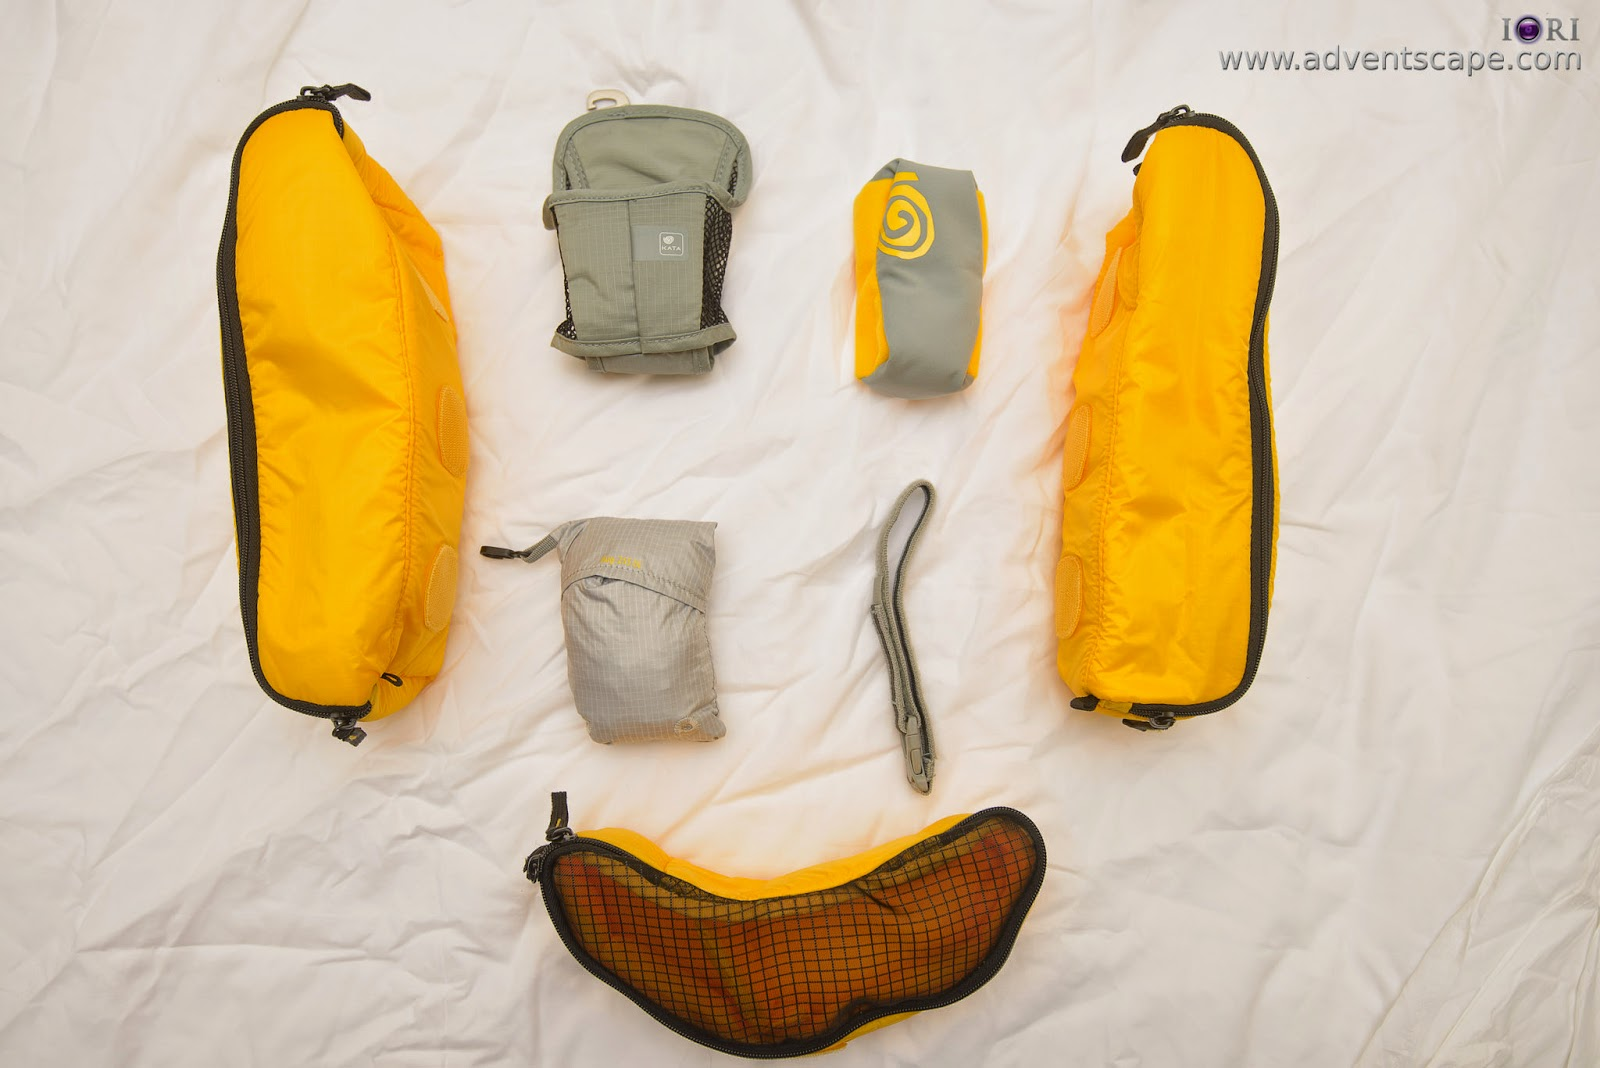 205, adventscape, Australian Landscape Photographer, bag, Bug, Kata, Manfrotto, Philip Avellana, review, accessories, pouch, strap, rain cover